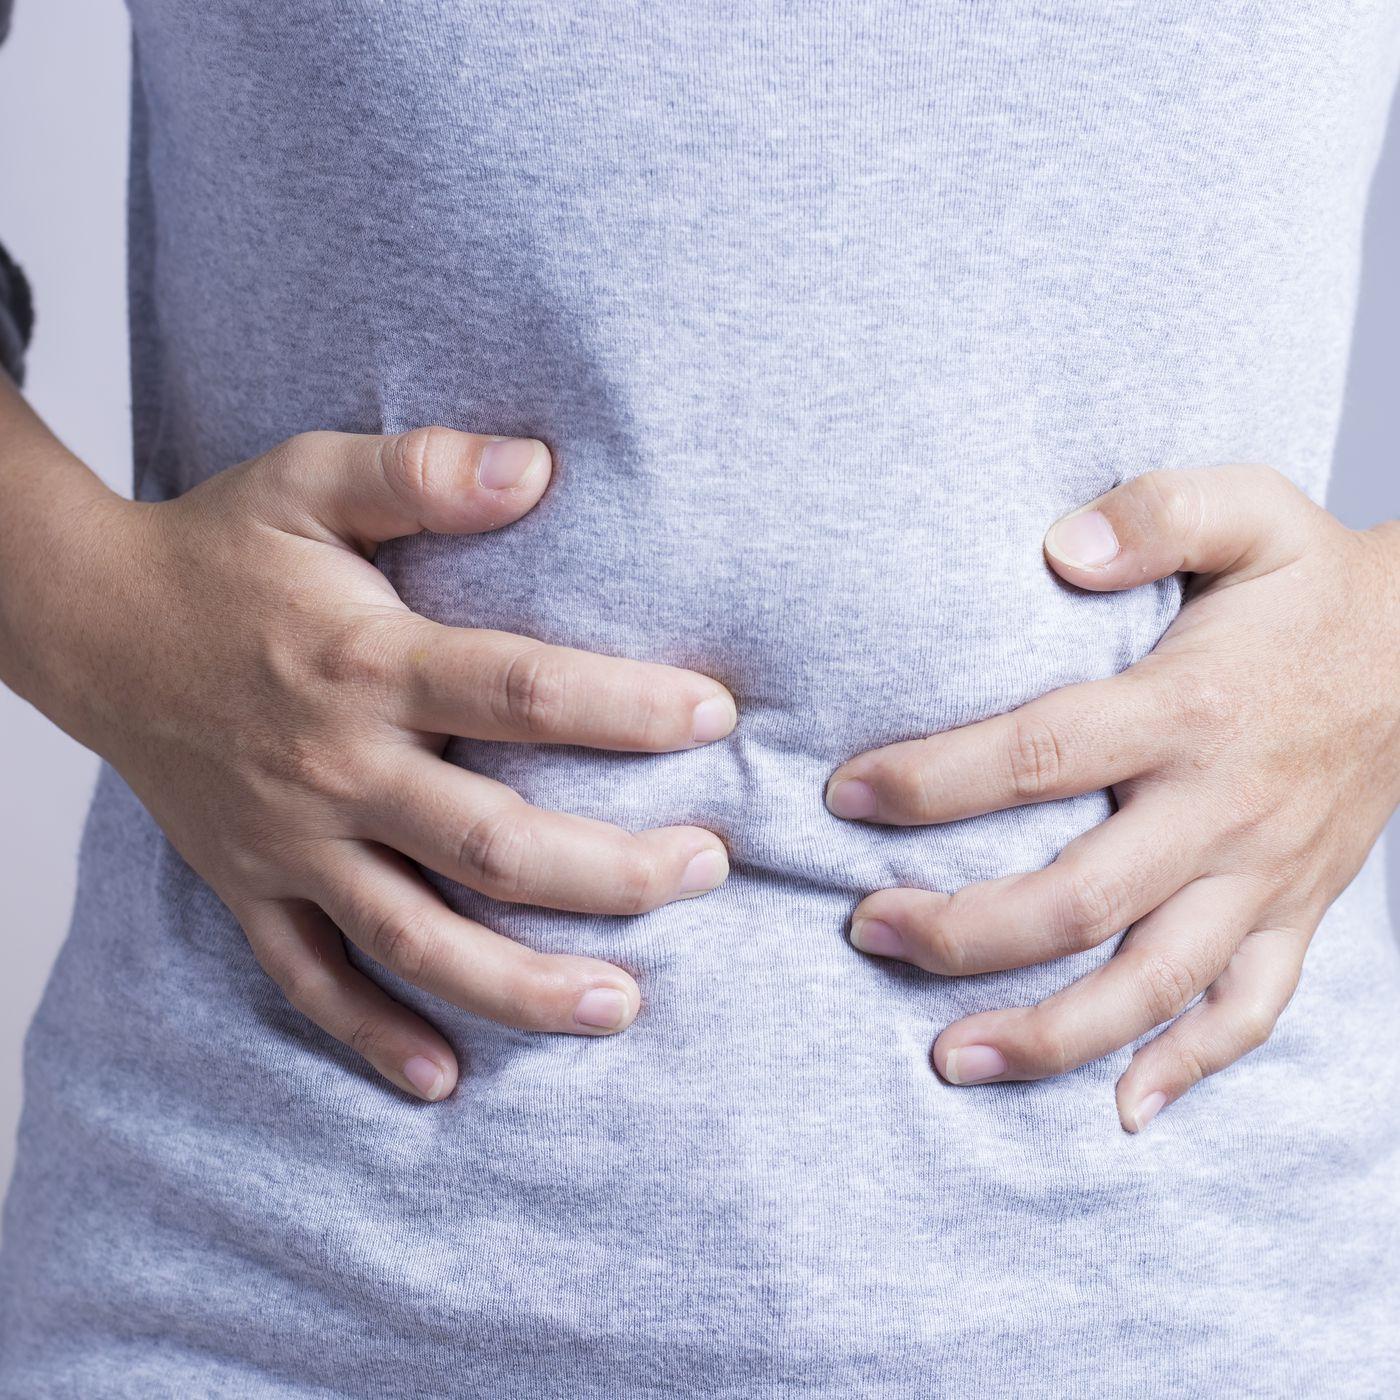 Diastasis recti, the post-pregnancy belly problem, explained - Vox